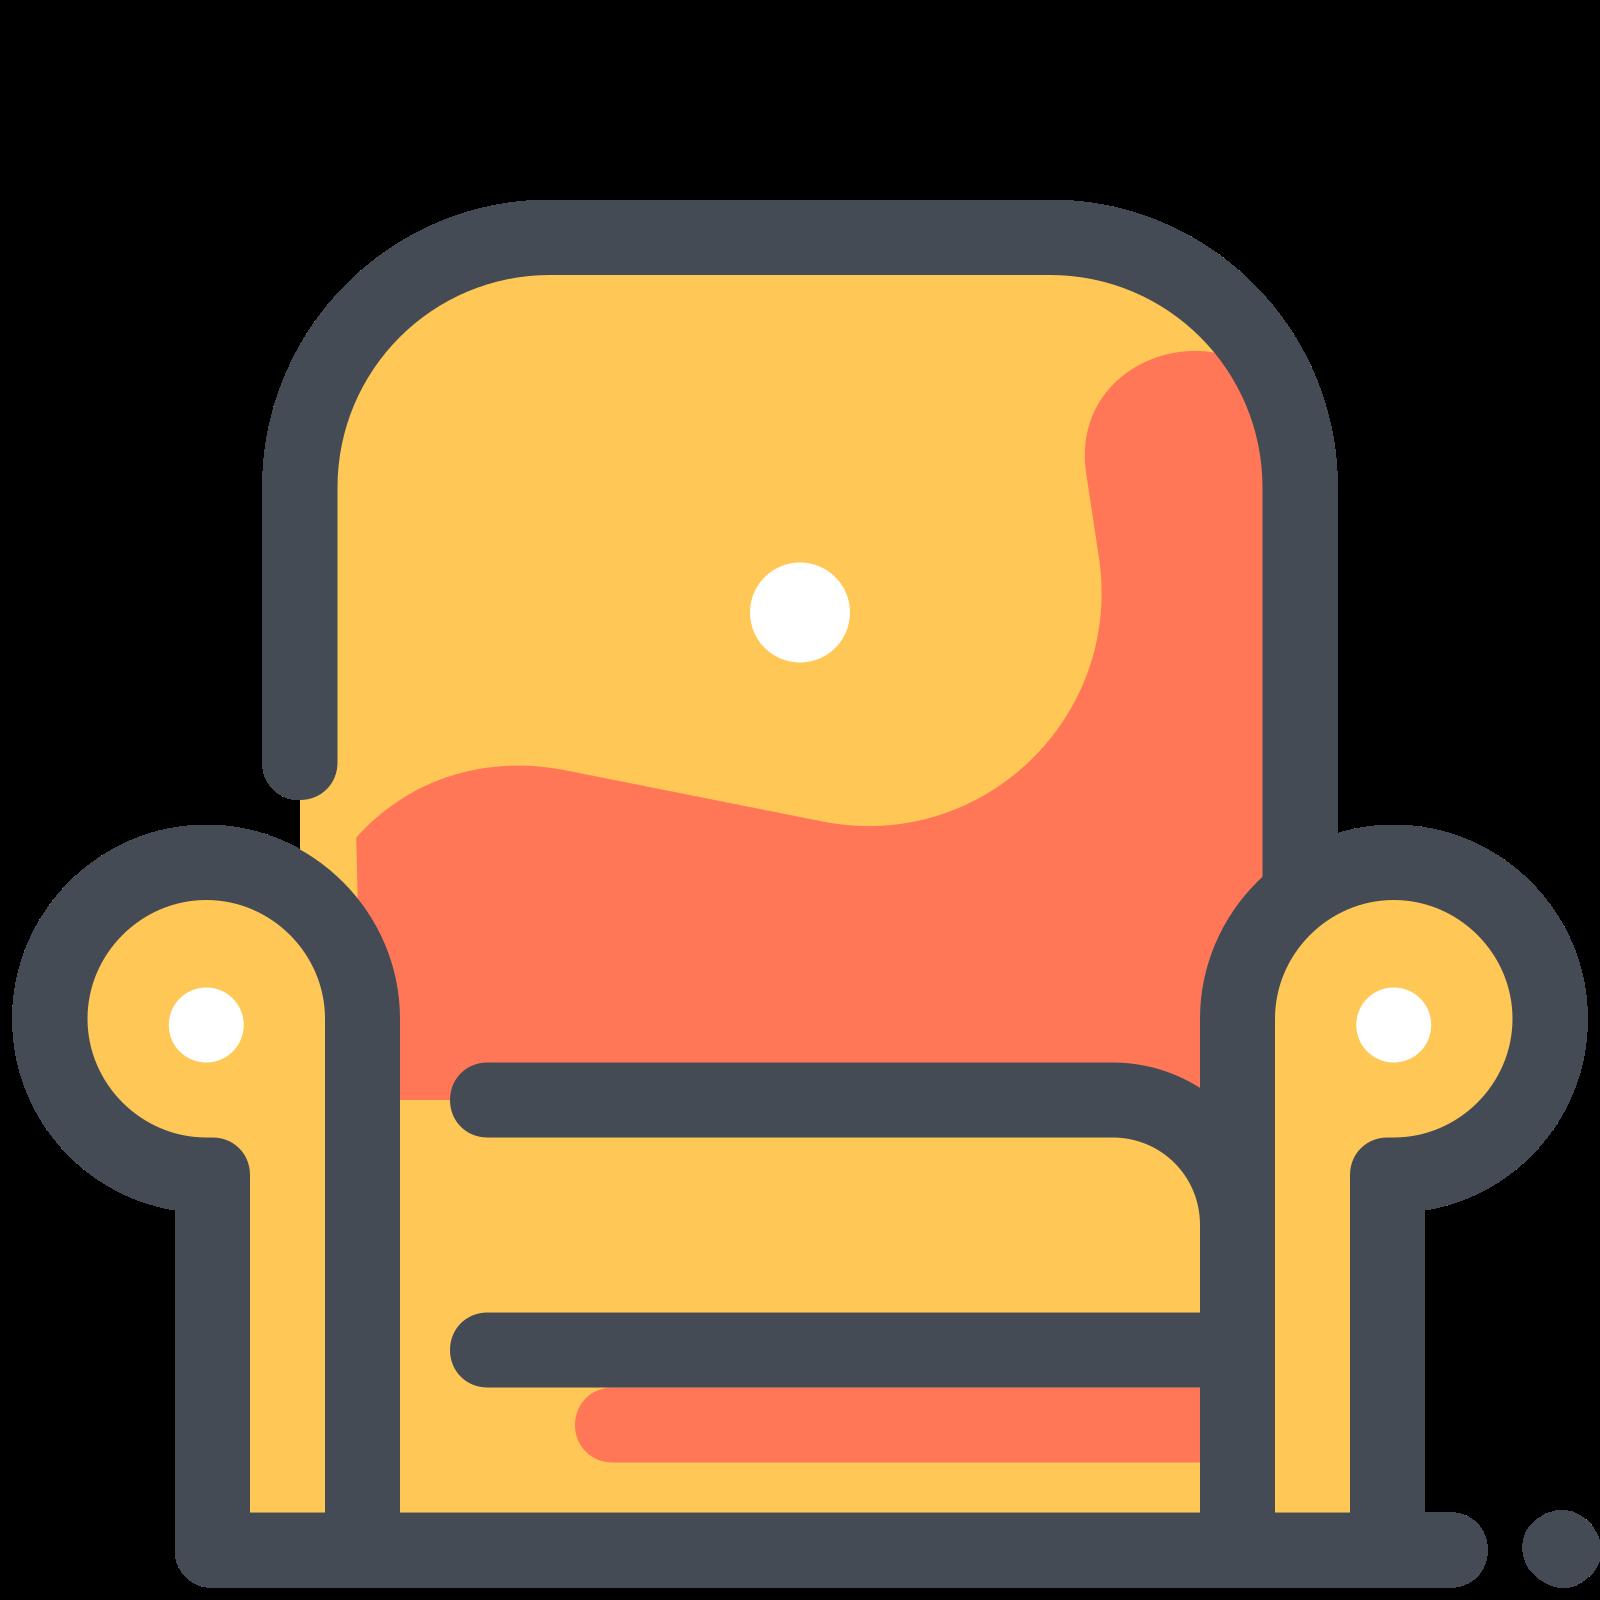 Sleeper Chair icon